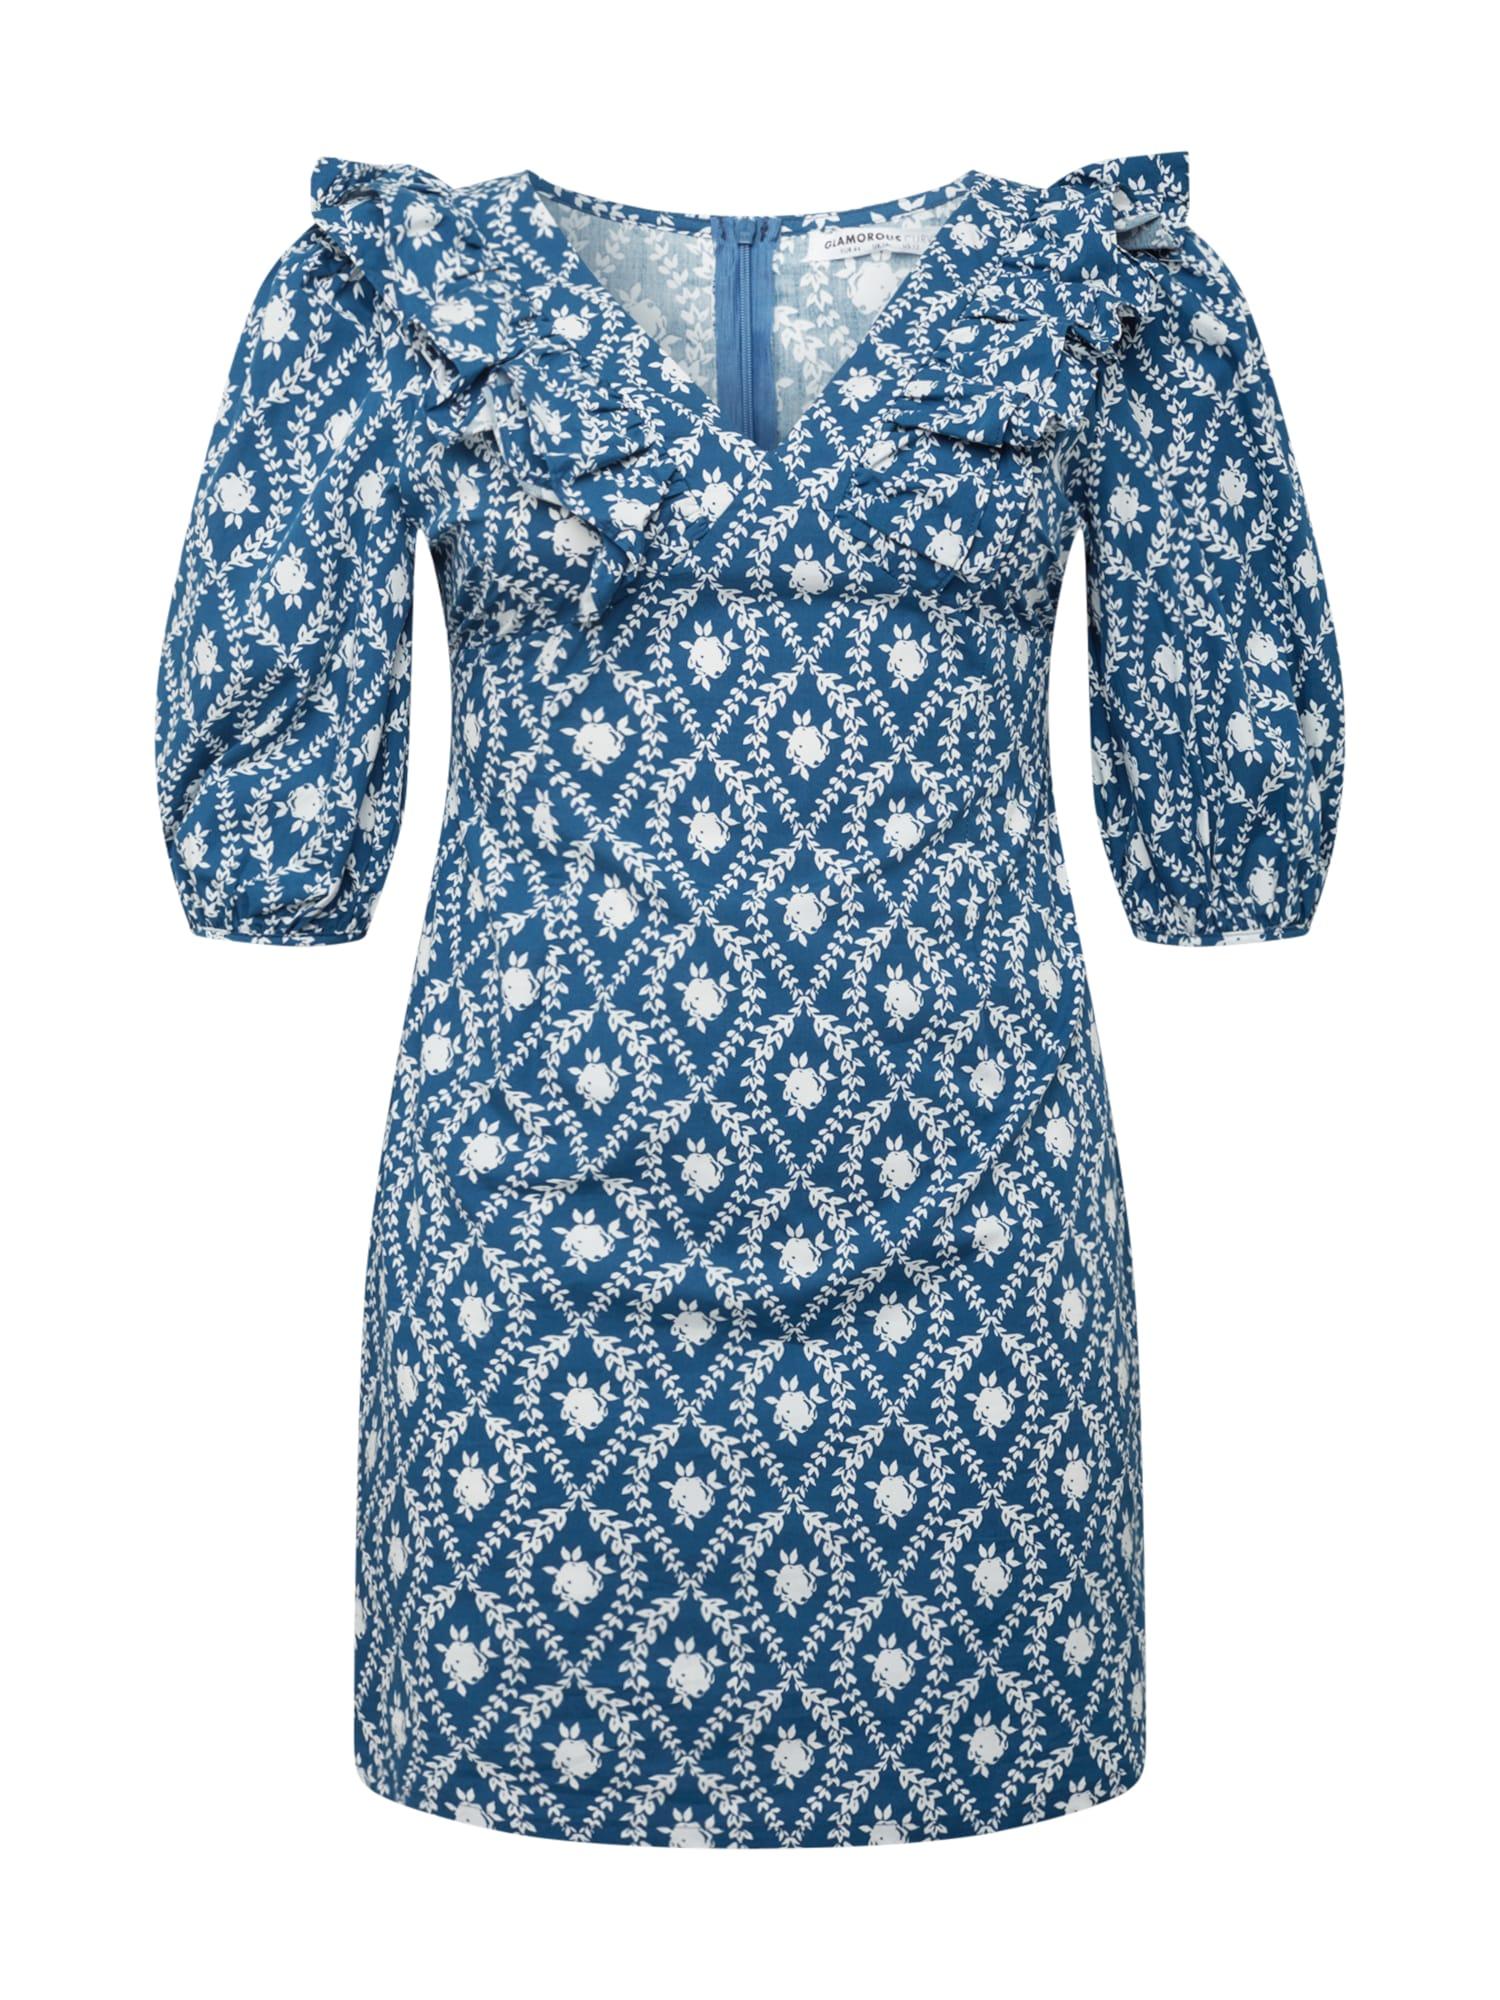 GLAMOROUS CURVE Suknelė balta / tamsiai mėlyna